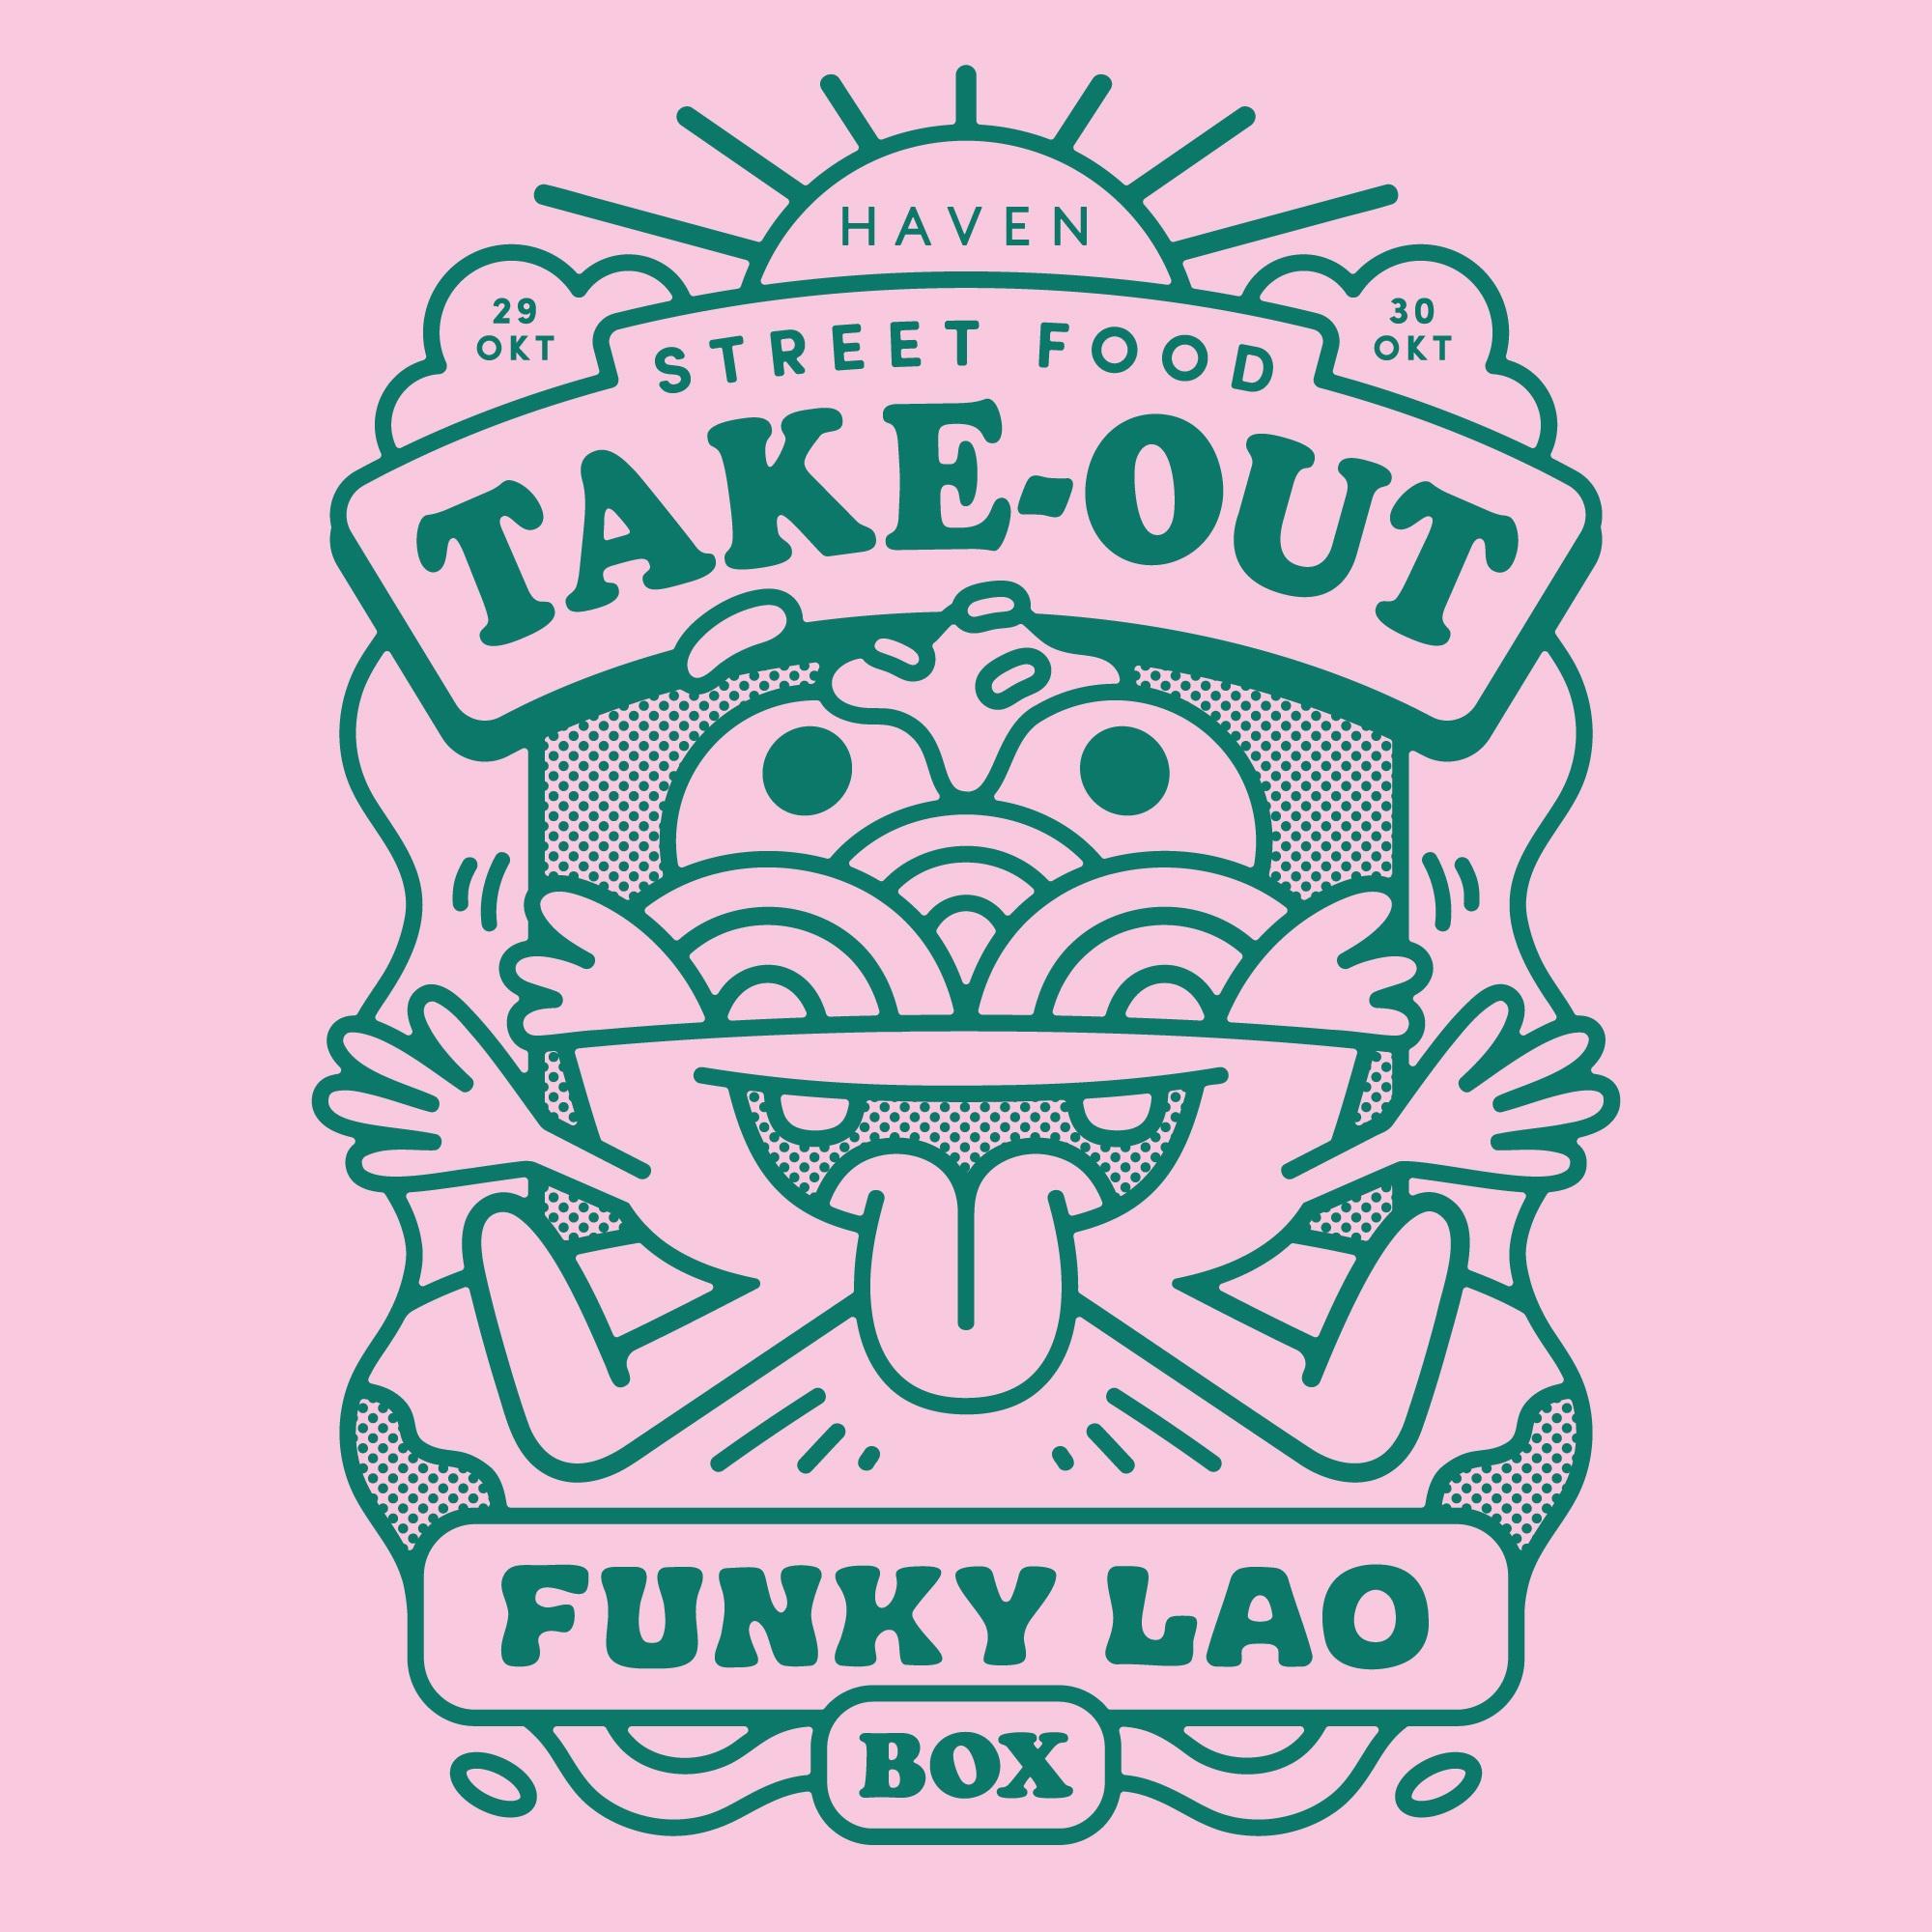 Funky Lao box